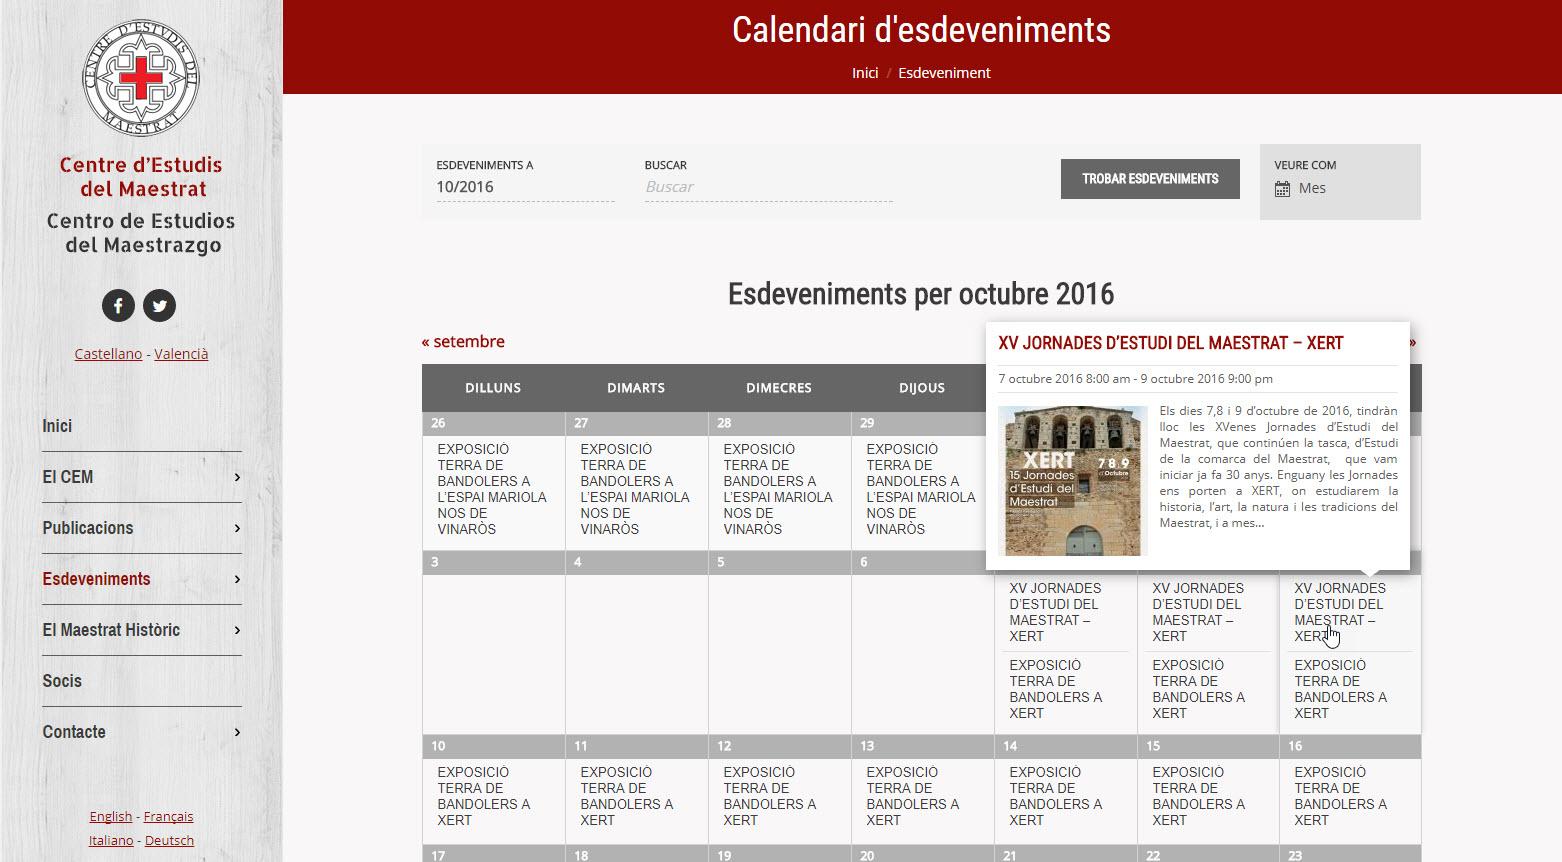 Web Centro Estudios Maestrazgo - Calendario de eventos